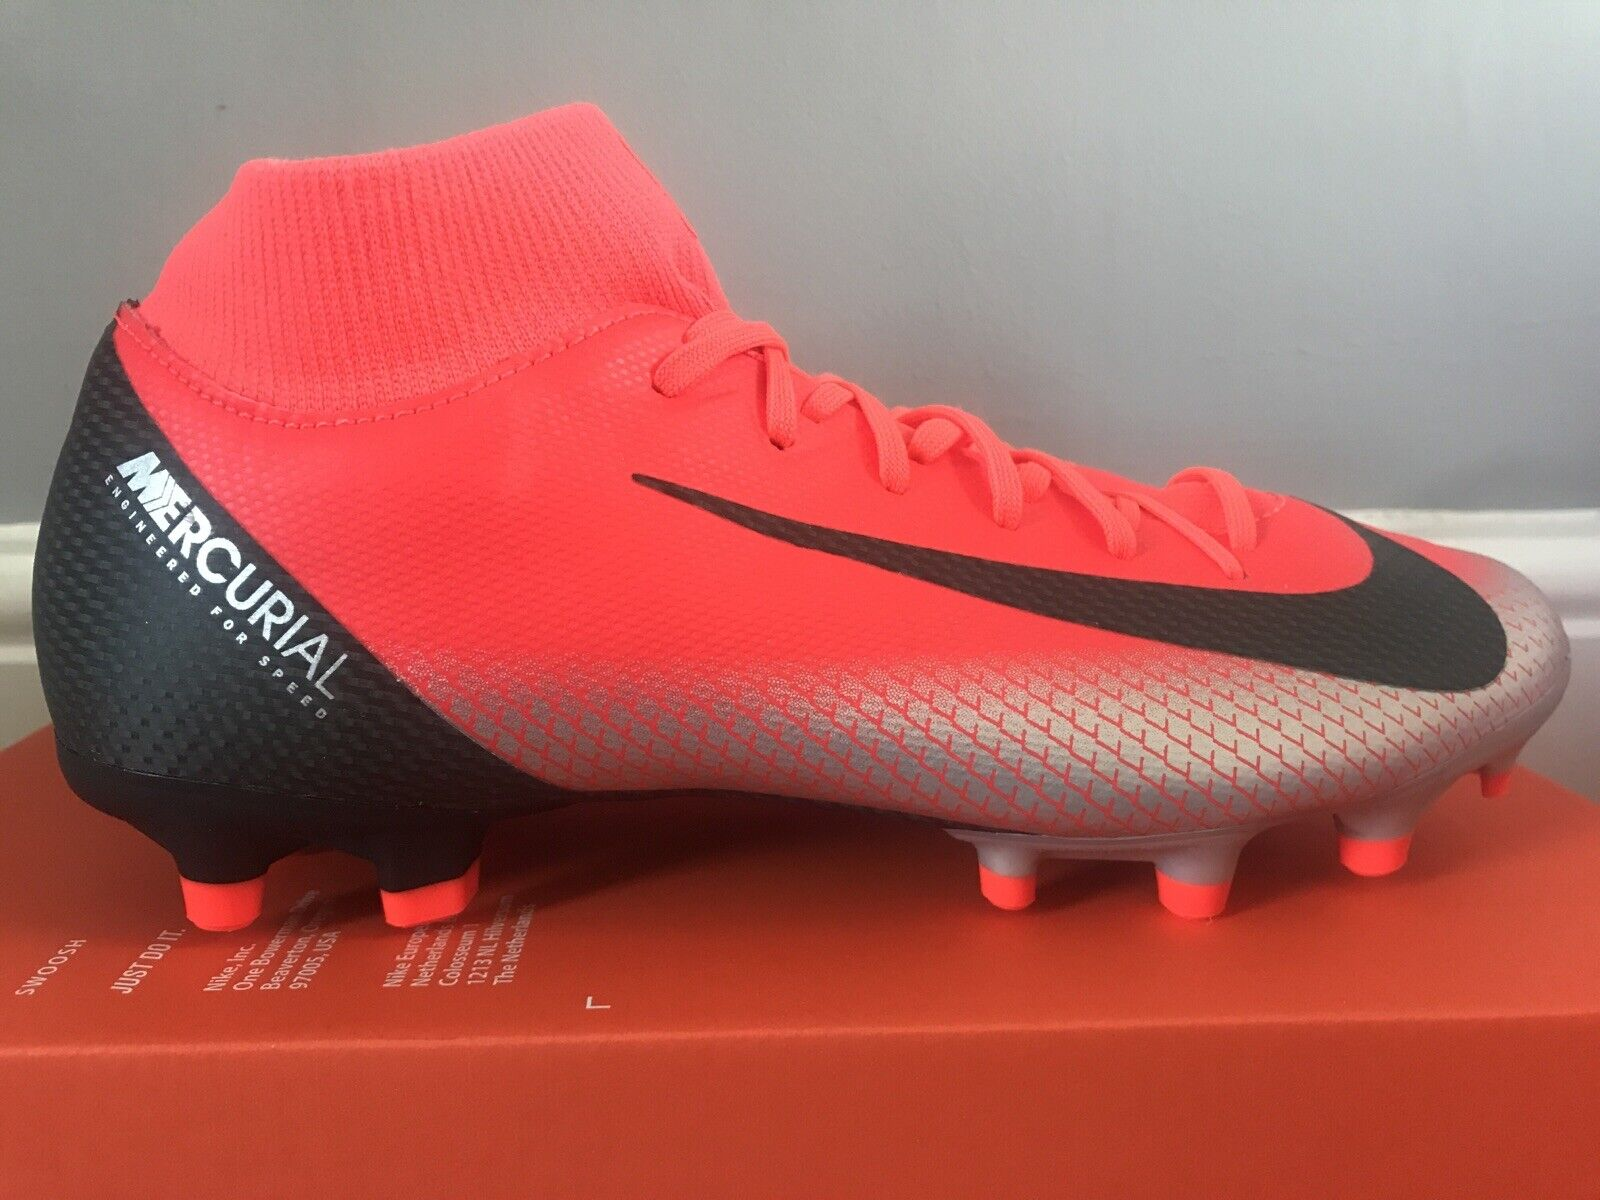 Ronaldo CR7 Boots Clothing Gear. Nike nz